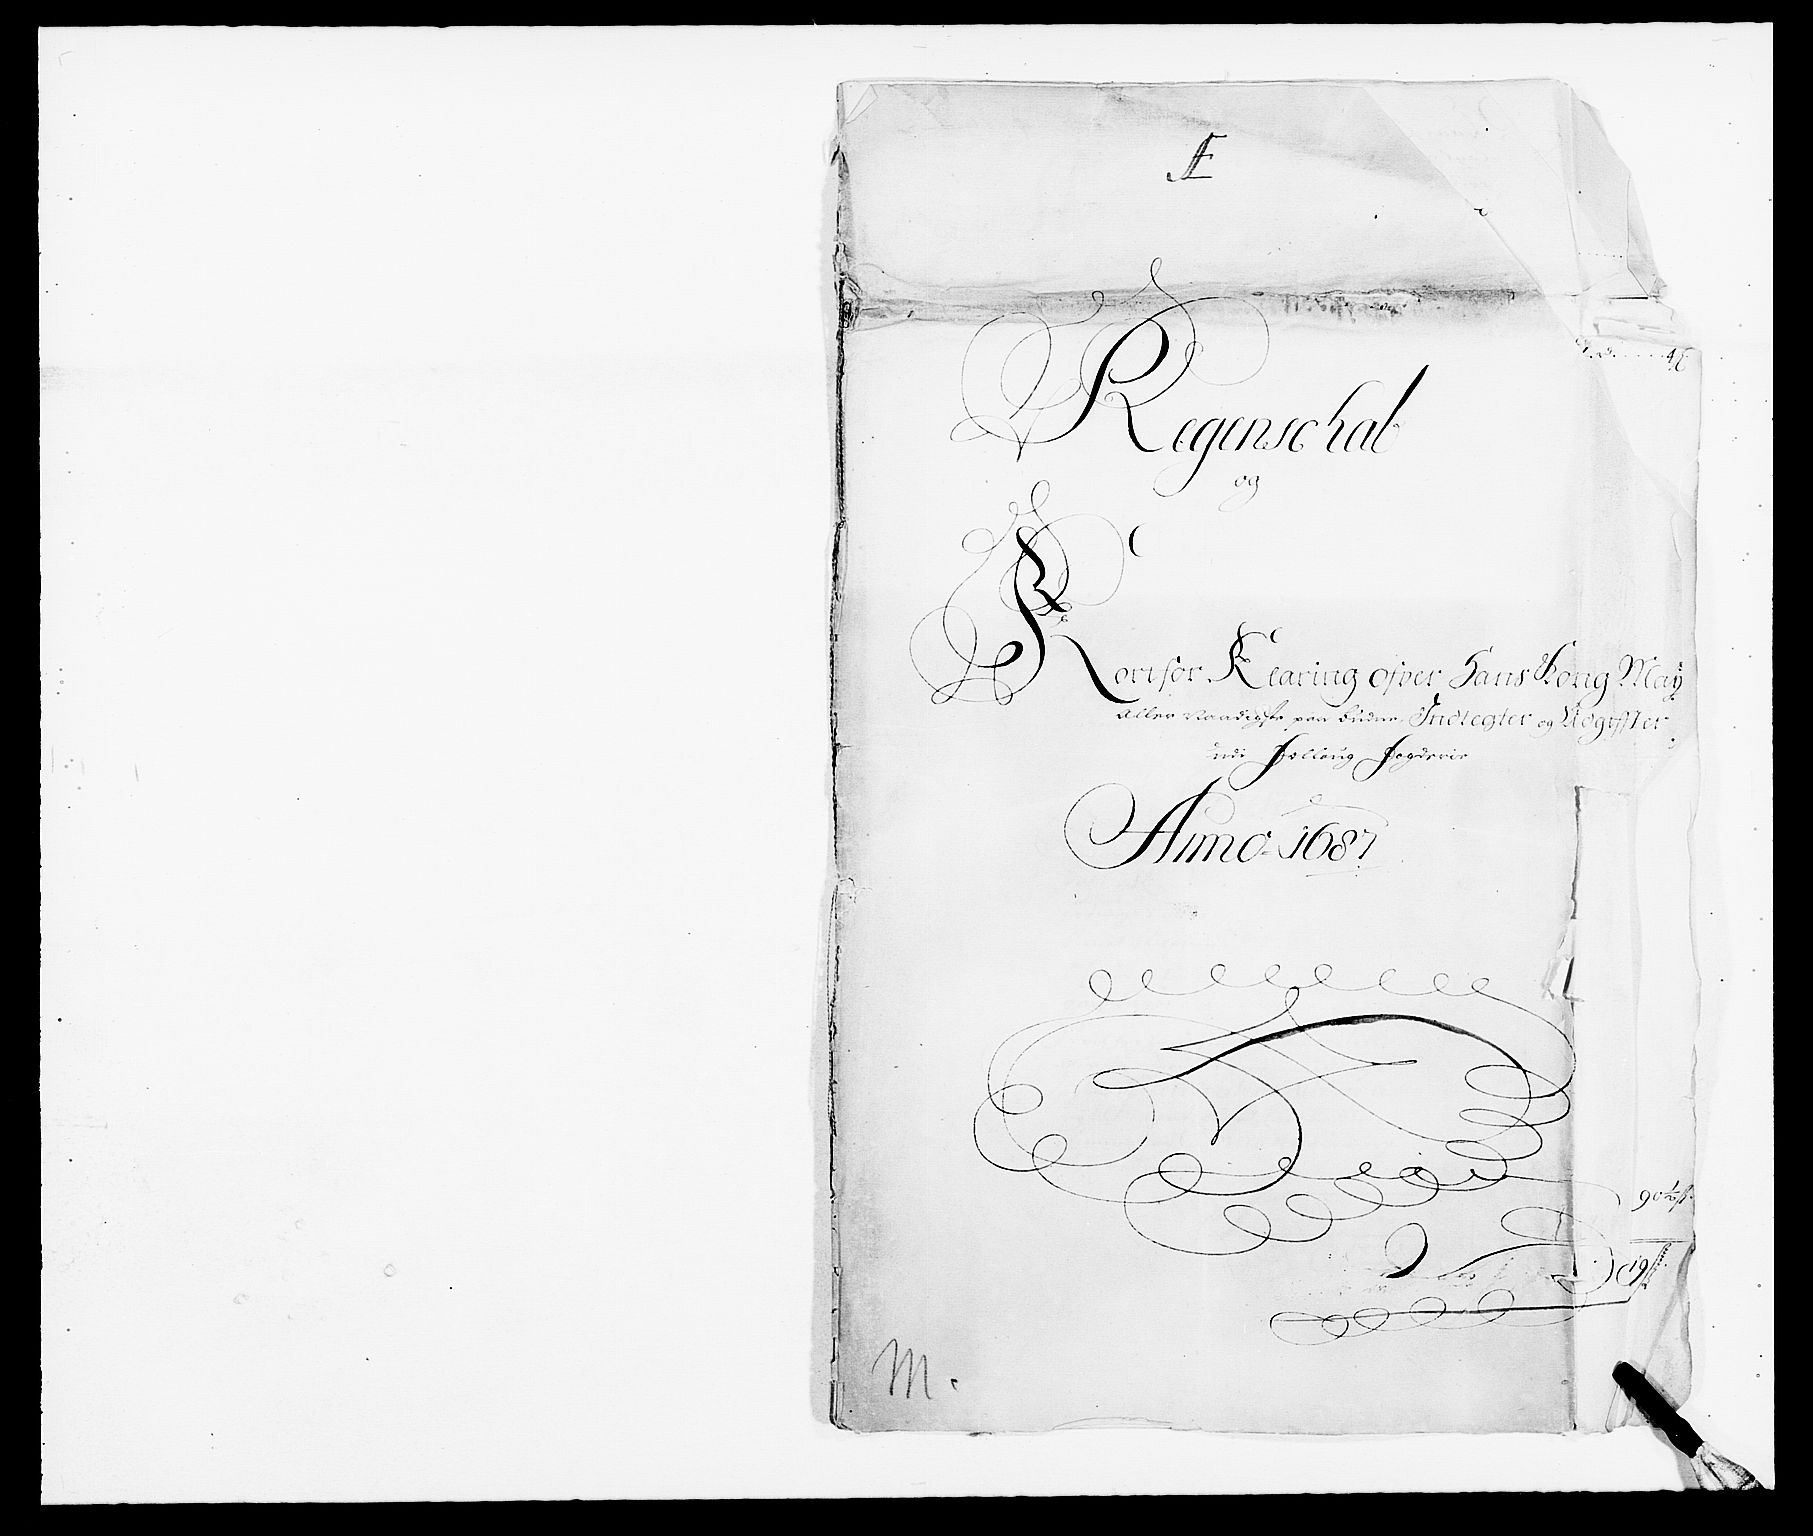 RA, Rentekammeret inntil 1814, Reviderte regnskaper, Fogderegnskap, R09/L0434: Fogderegnskap Follo, 1687-1688, s. 2